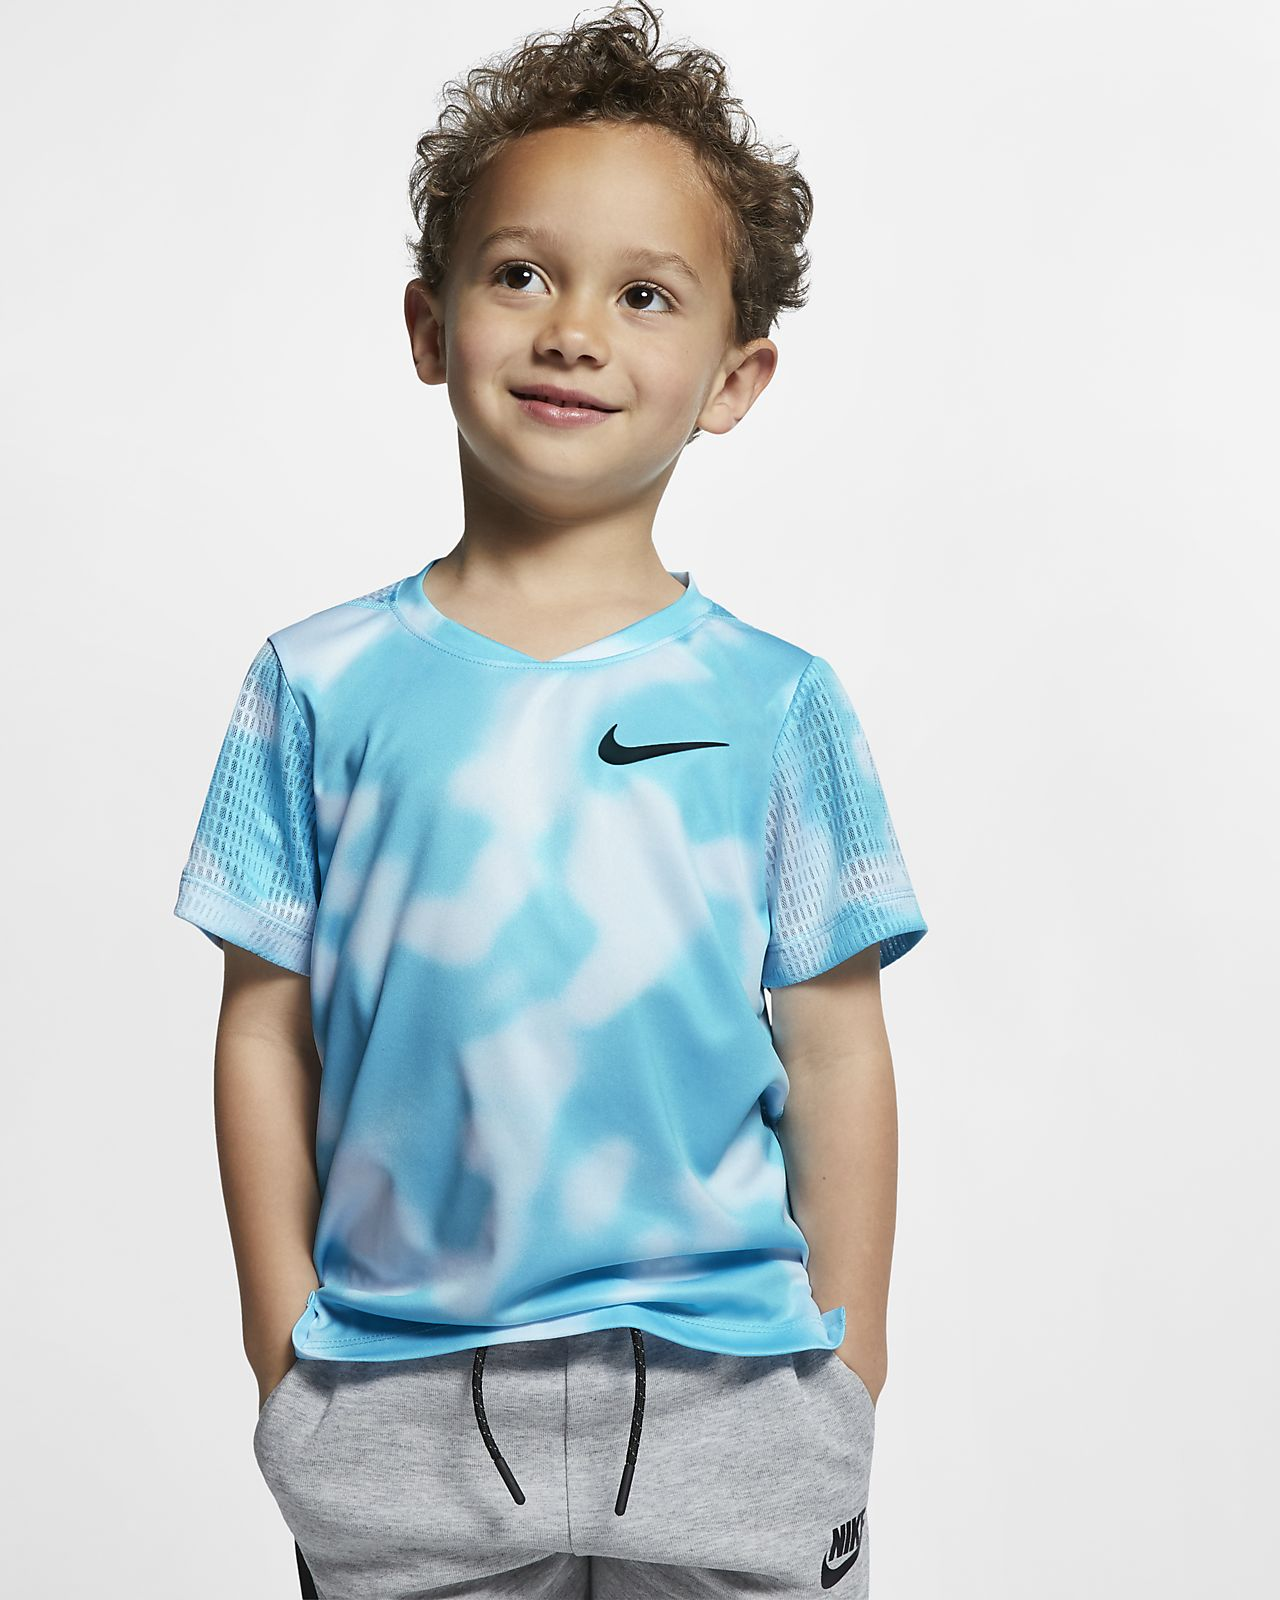 Tröja Nike Dri-FIT för små barn